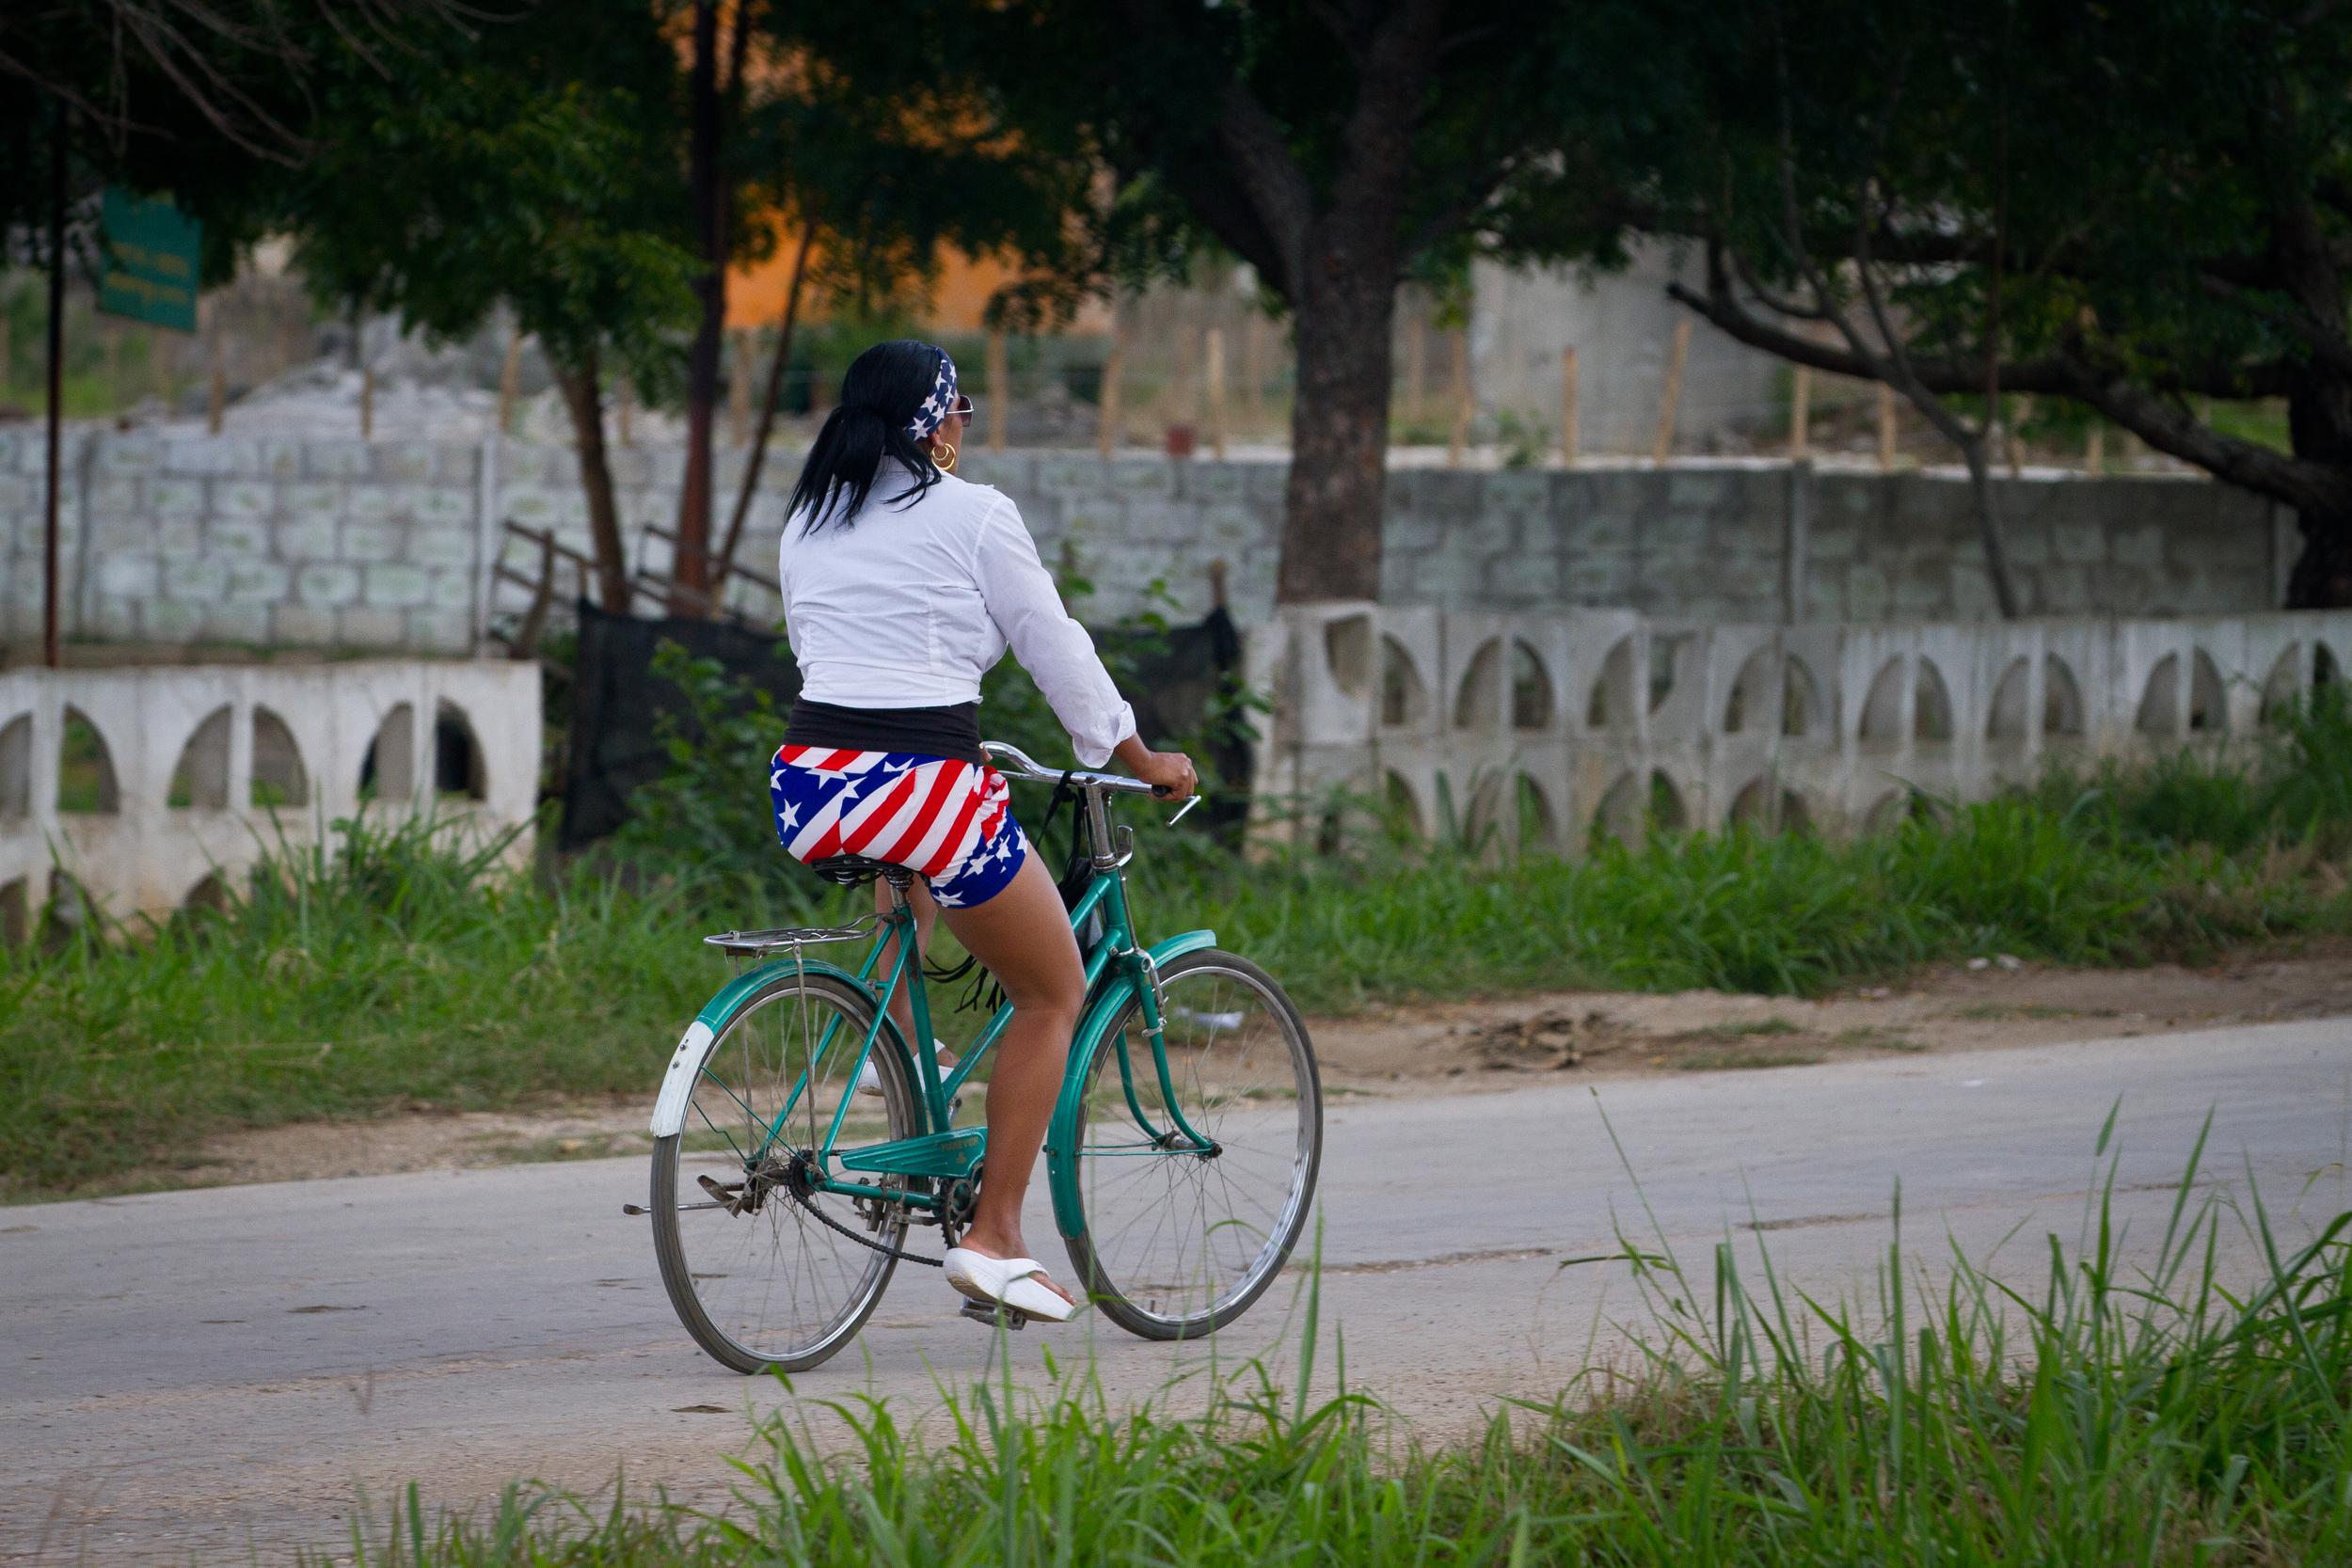 Local girl showing her love for everything American, Ciego de Avila, Cuba